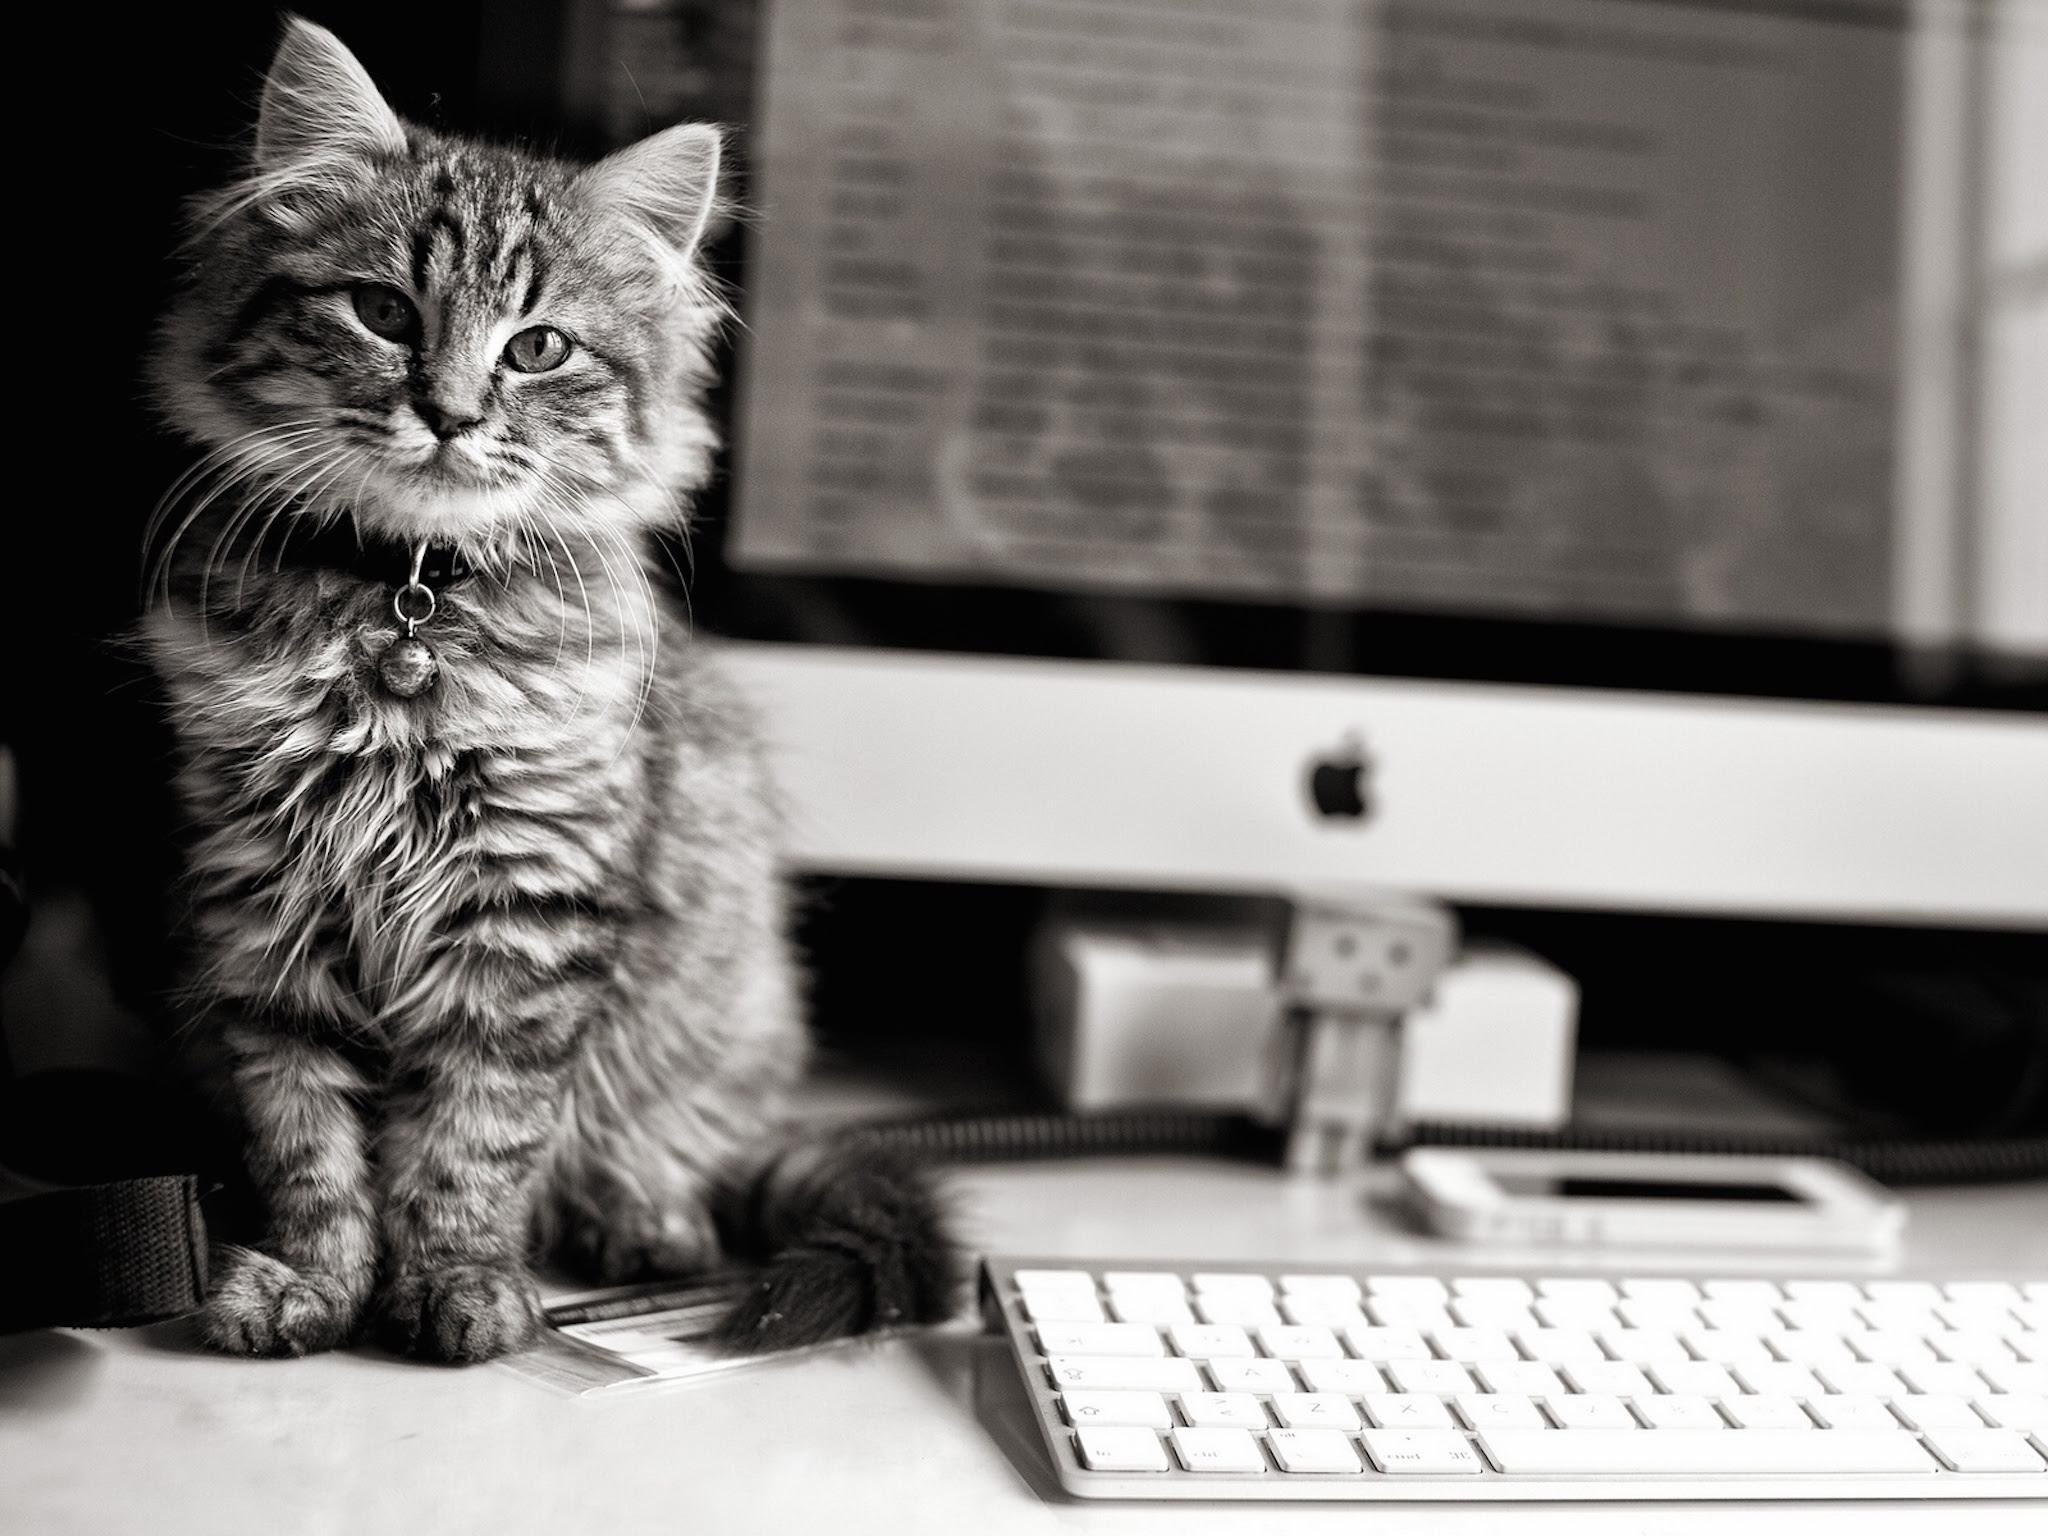 Imac Cat Wallpaper Wallpapergeeks Com